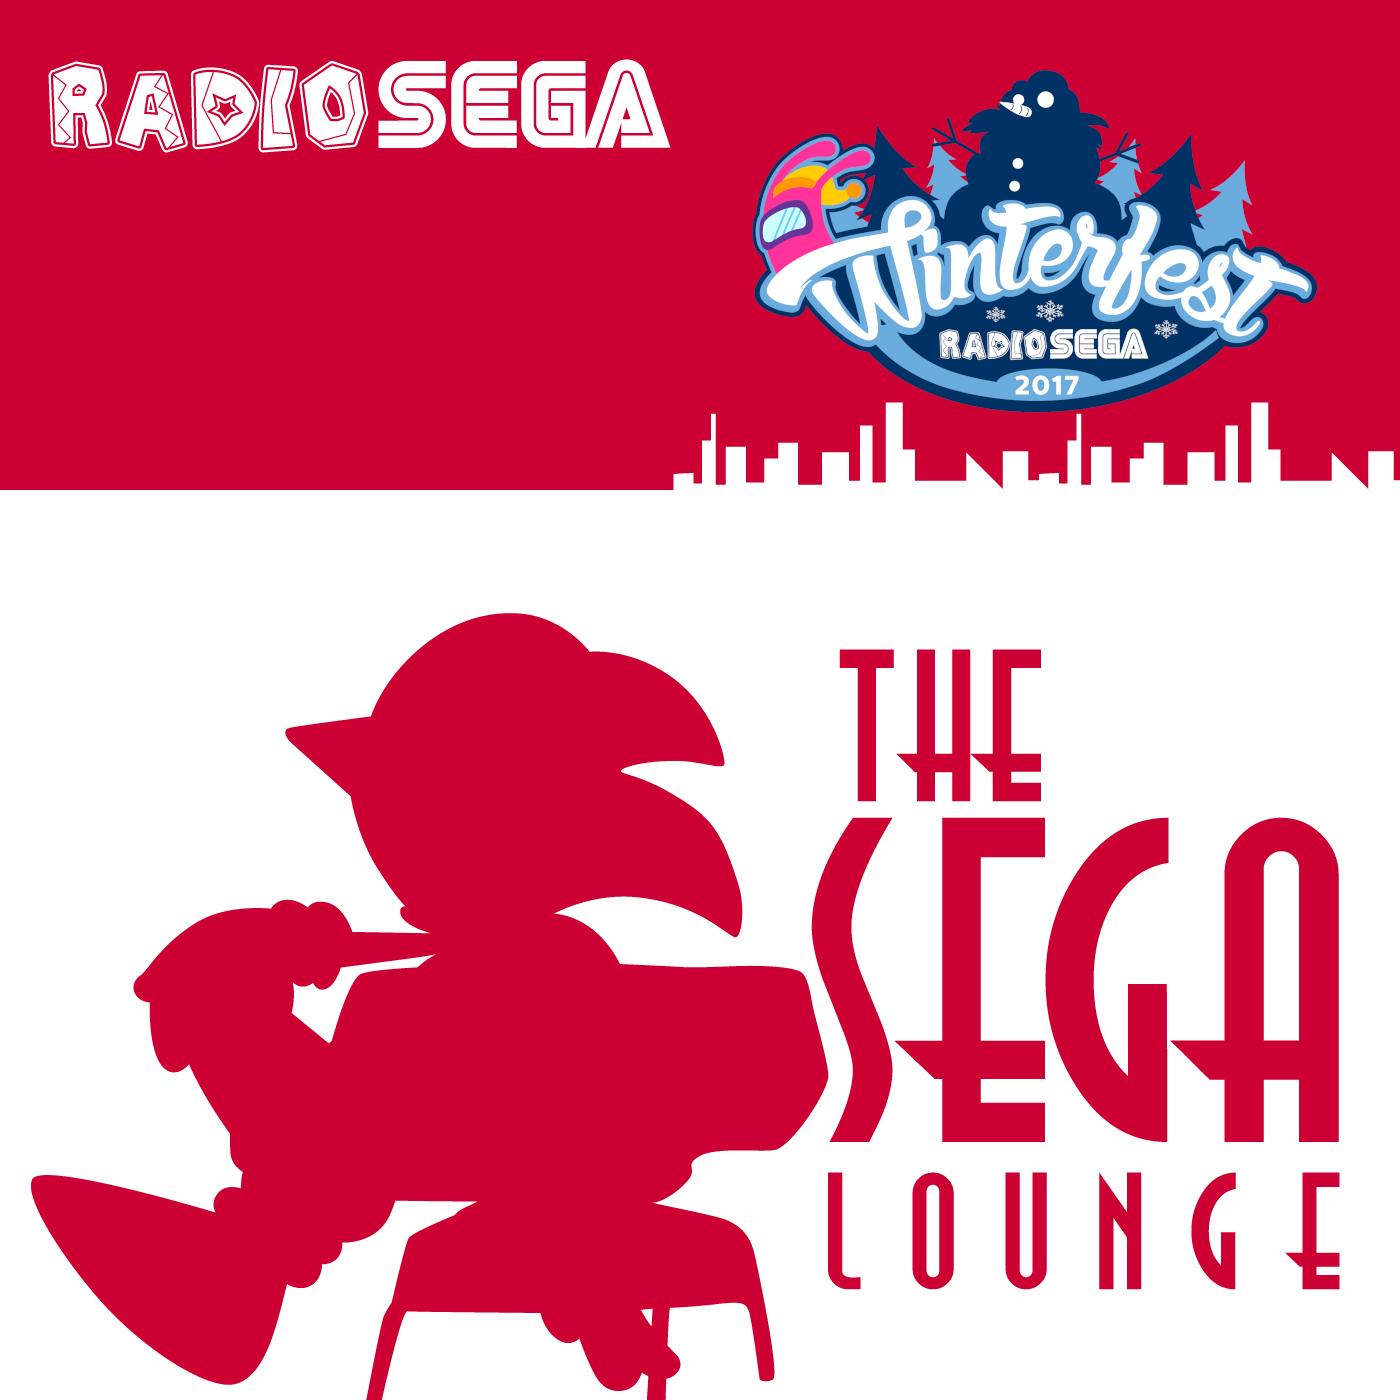 94 - Sonic Mania Remixed Image